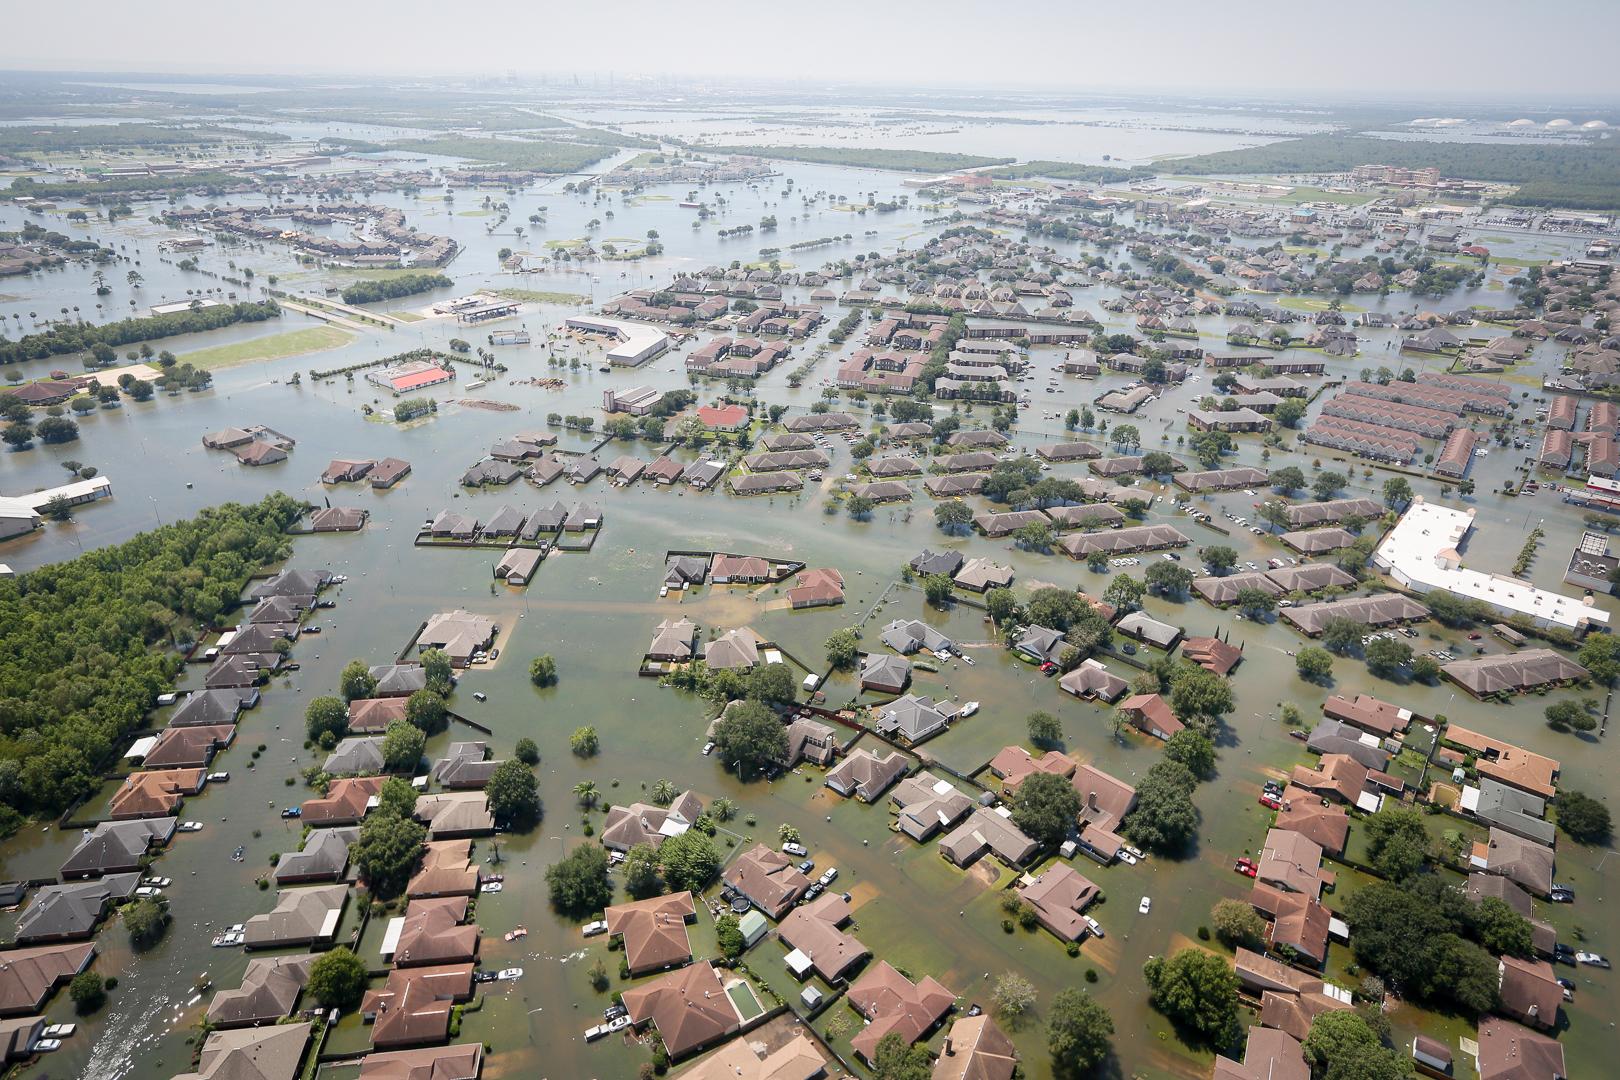 Support_during_Hurricane_Harvey_(TX)_(50).jpg